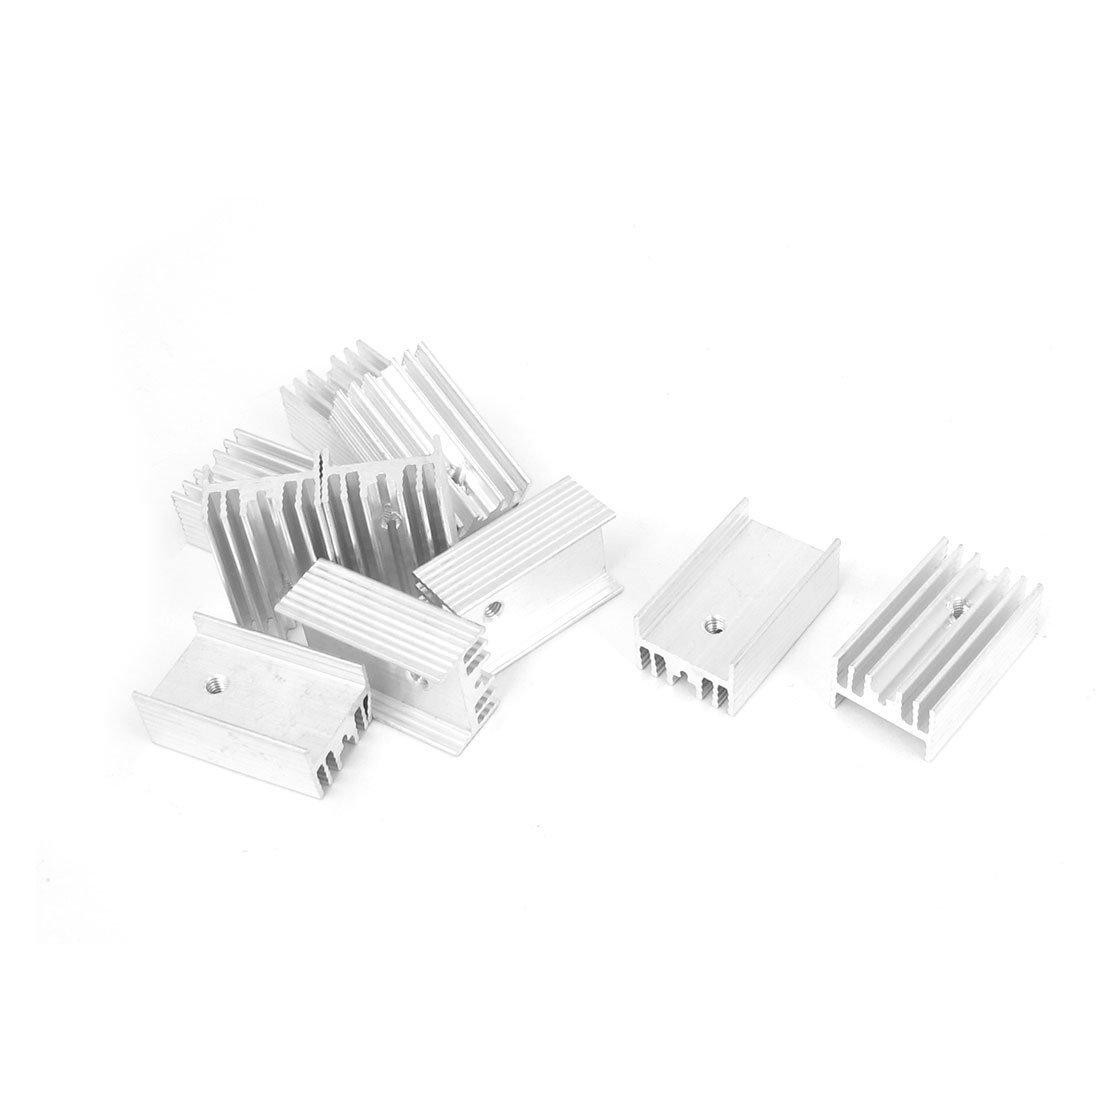 uxcell Aluminum TO220 Power IC Heat Sink Radiator Heatsink 25x15x10mm 10pcs